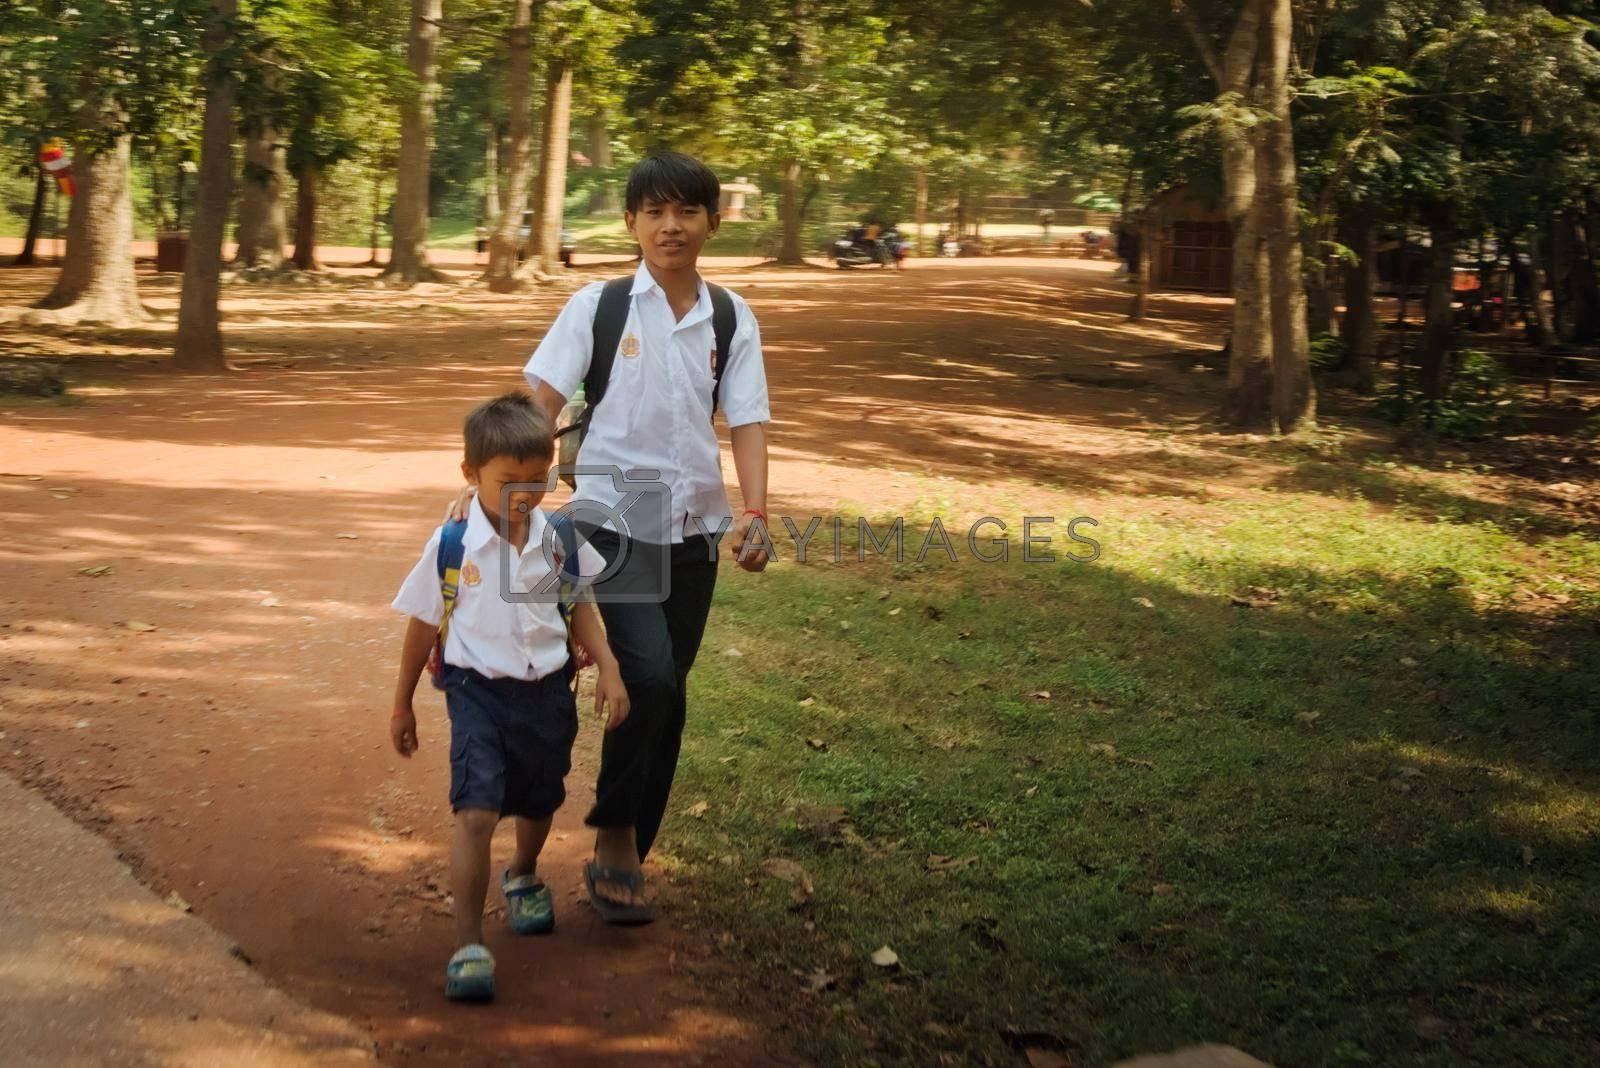 Royalty free image of 2019-11-15 / Siem Reap, Cambodia - Two boys in school uniform walk down a dirt road in a rural area. by hernan_hyper